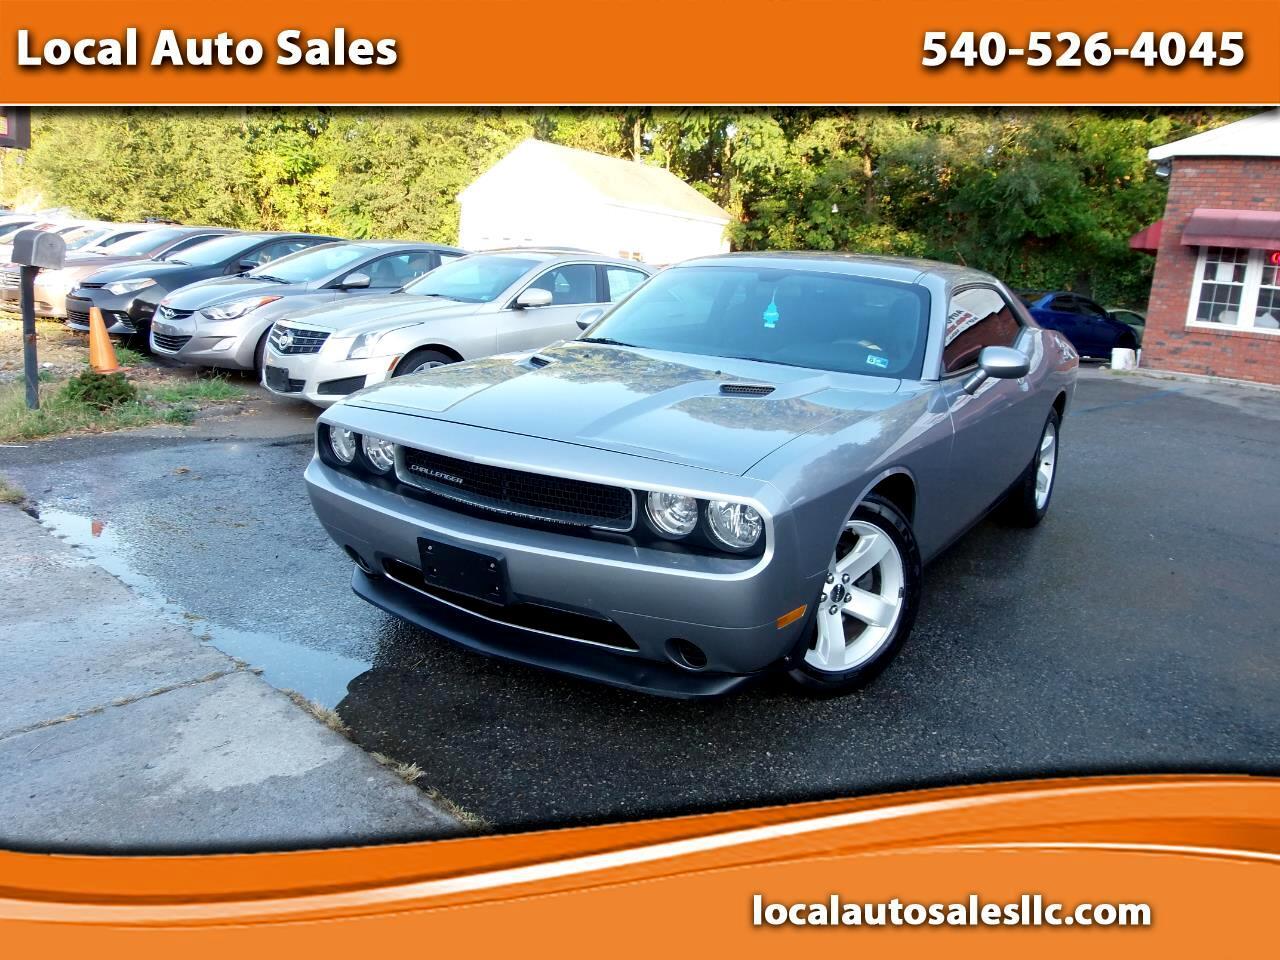 Used Trucks For Sale In Va >> Used Cars Roanoke Va Used Cars Trucks Va Local Auto Sales